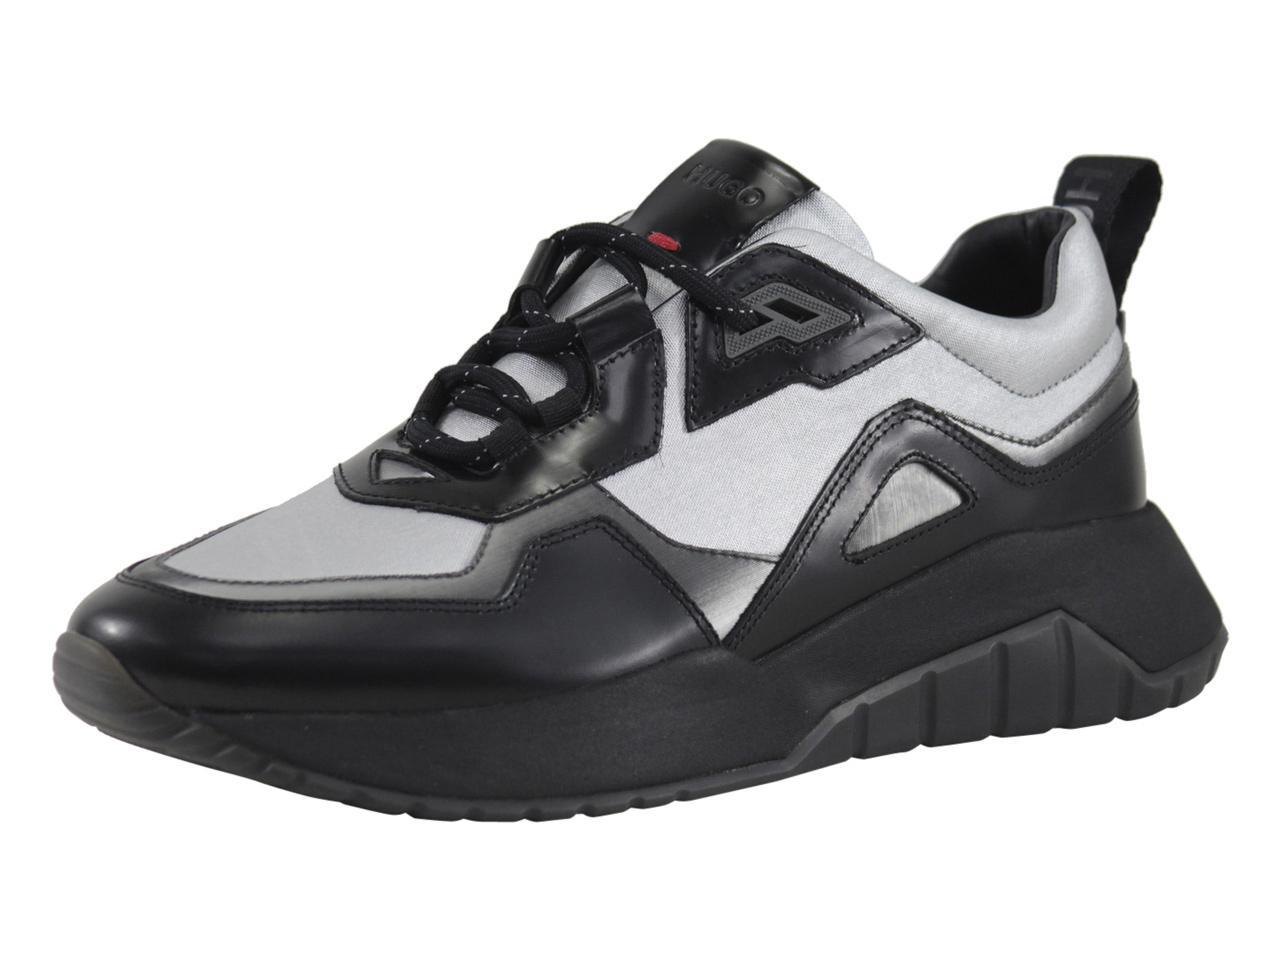 Hugo Boss Men's Atom Sneakers Shoes